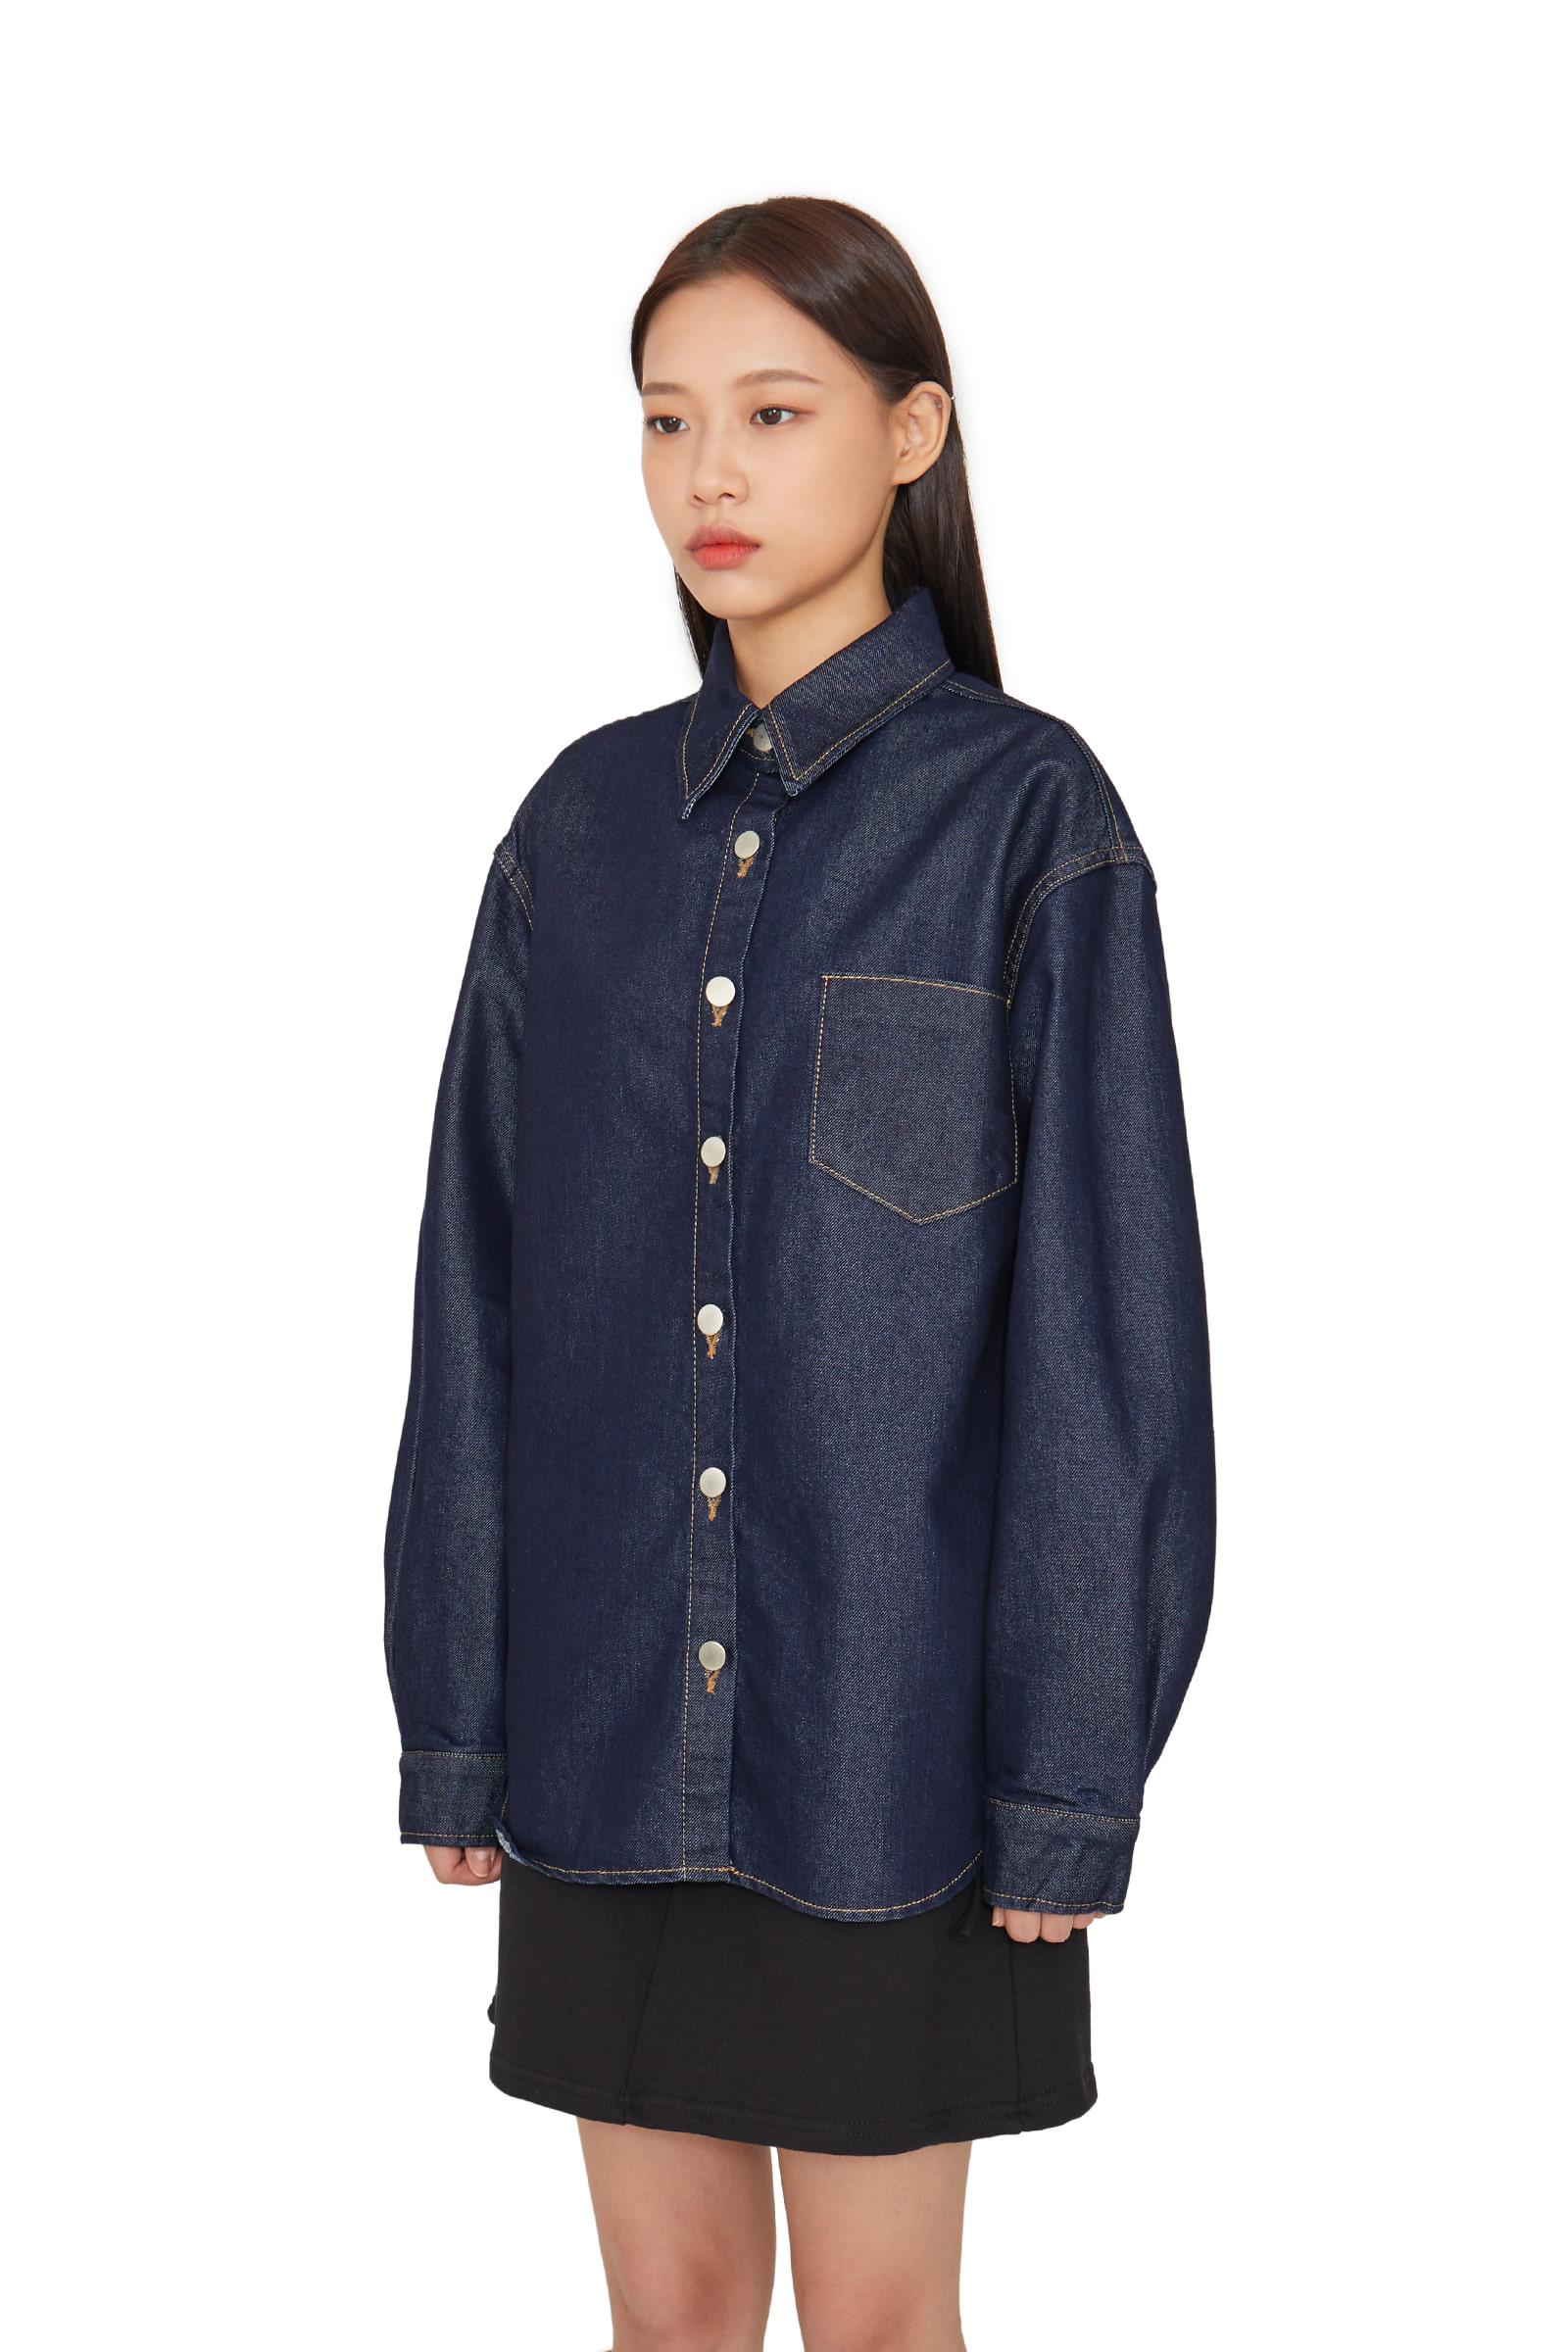 Great denim shirt jacket